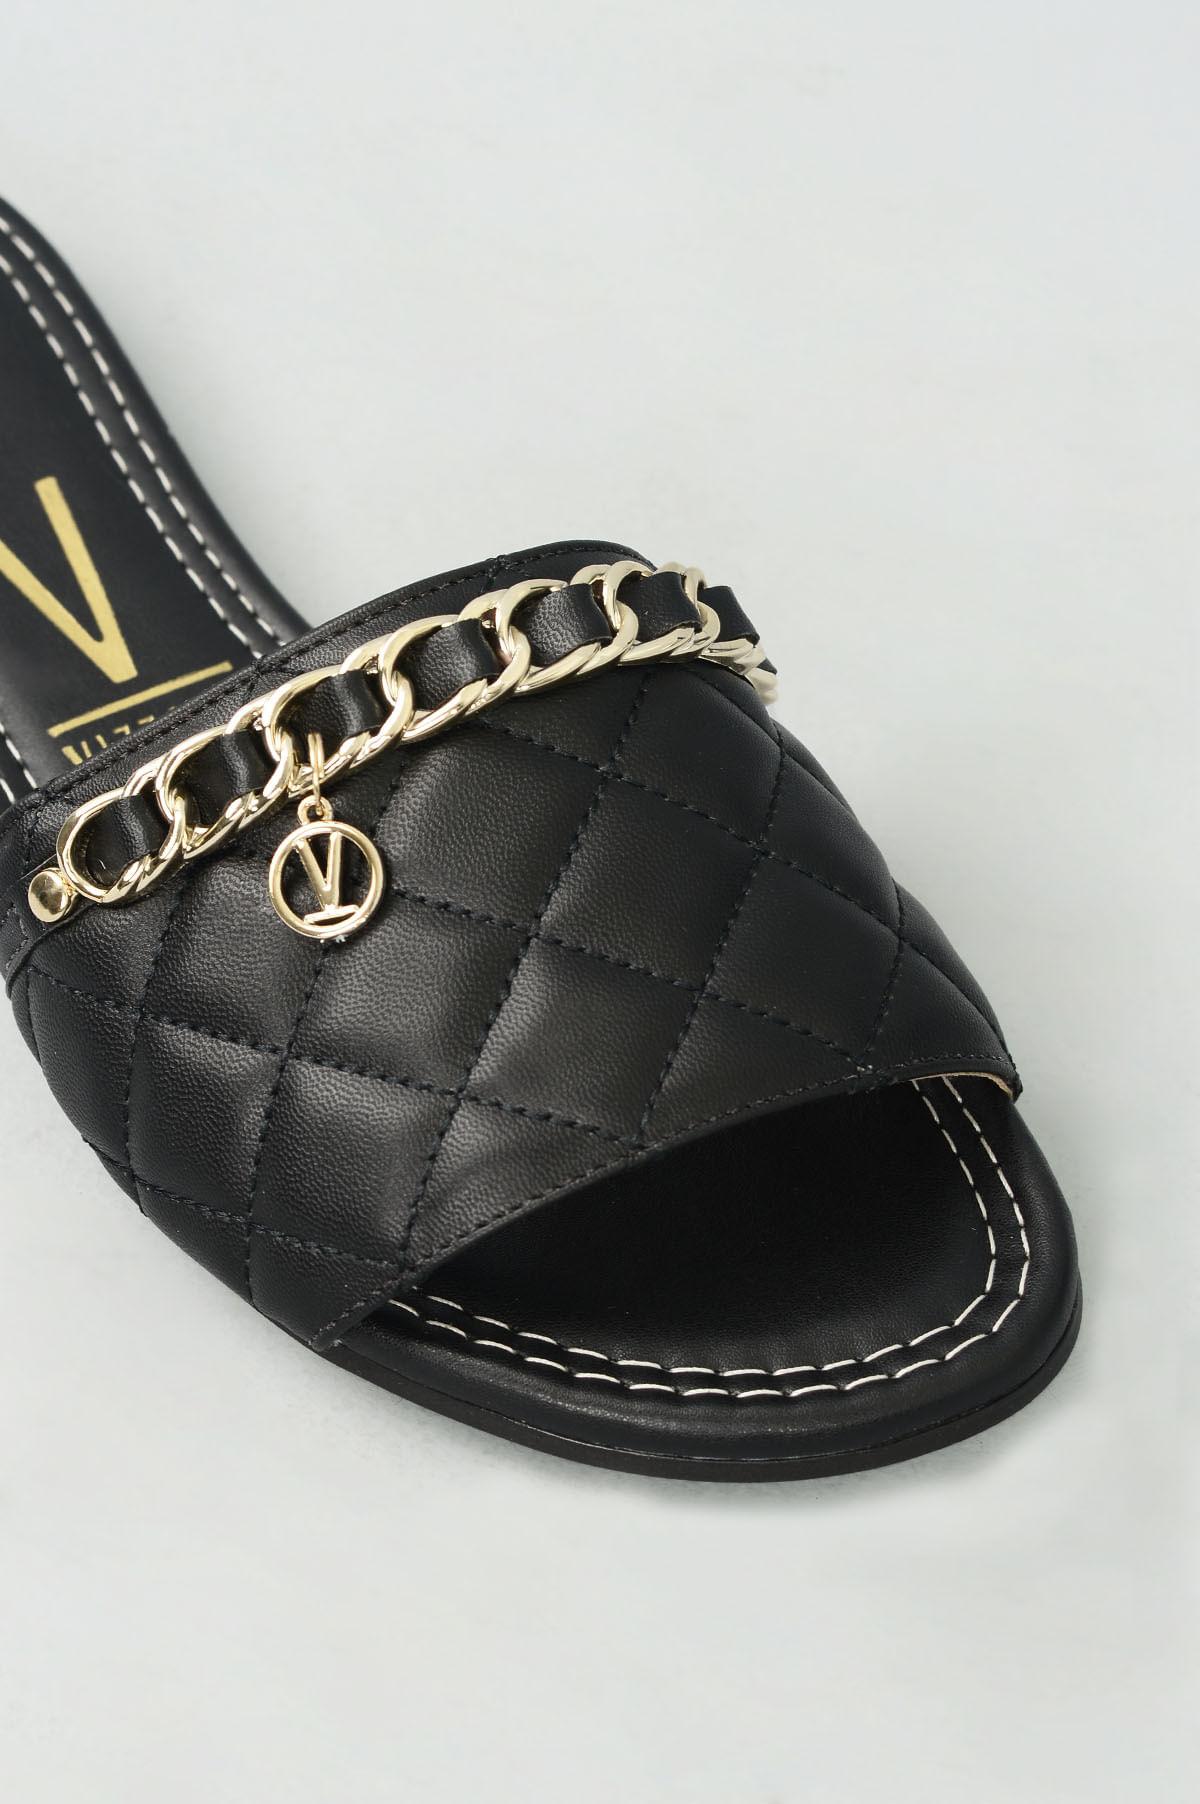 b1b189bc19 Chinelo Feminino Késia Vizzano SINT - PRETO - Mundial Calçados